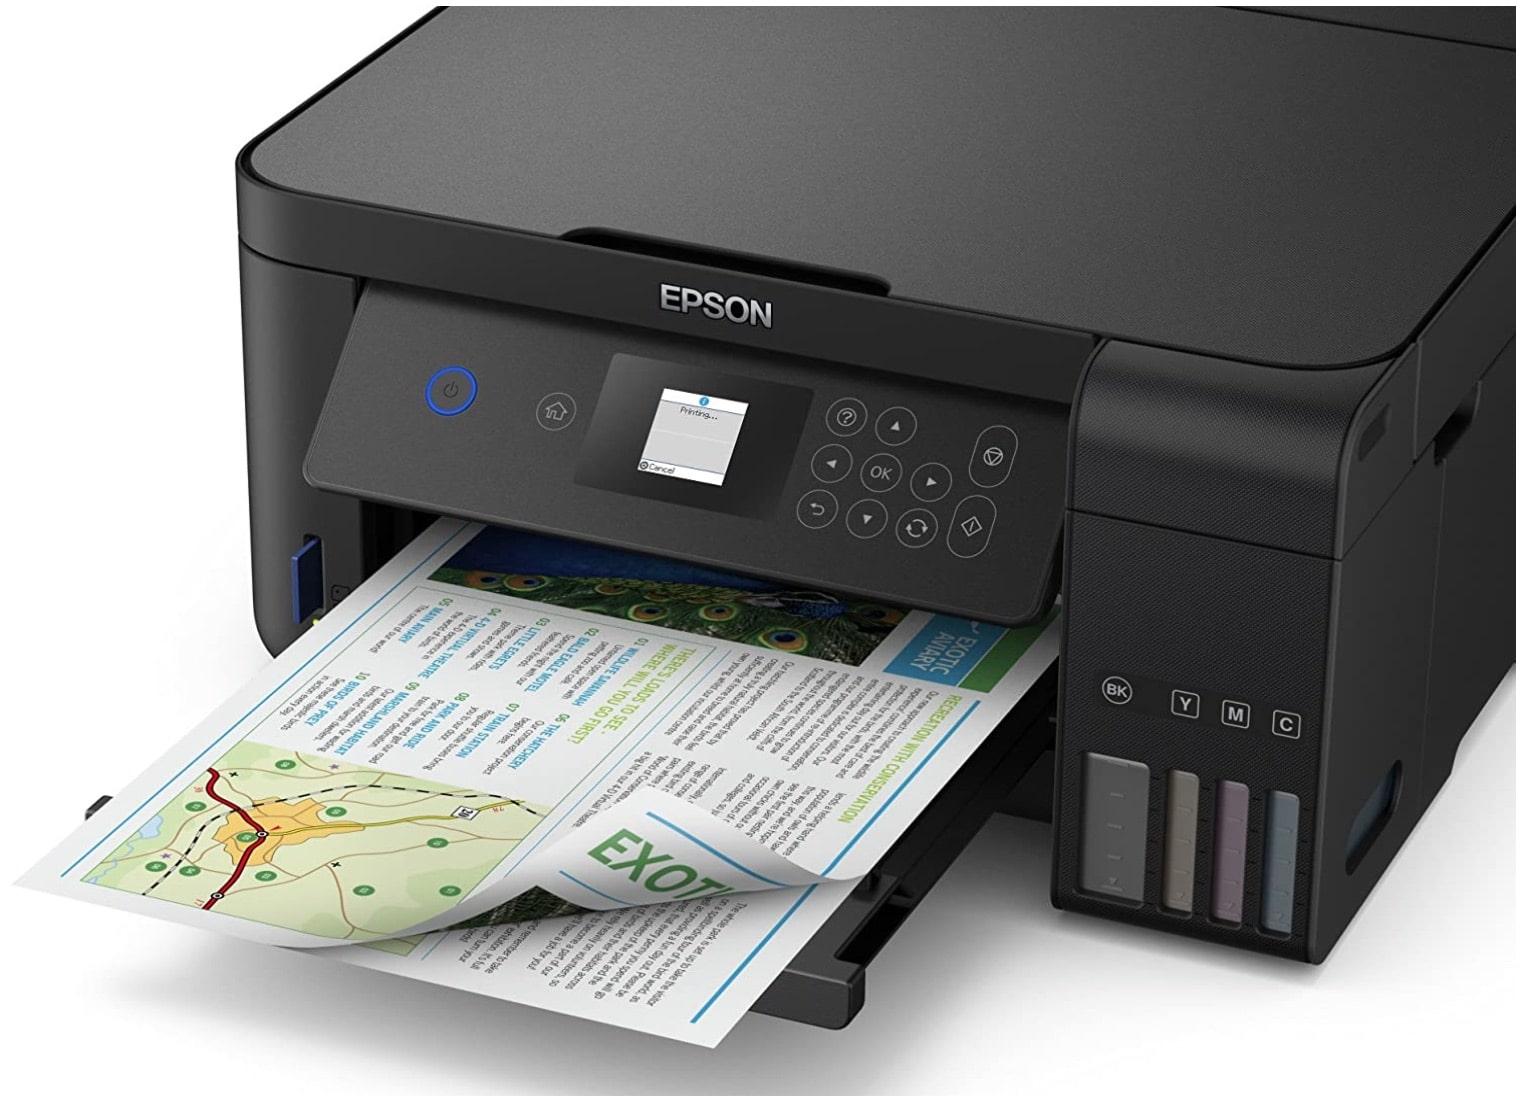 Epson ECOTANK ET-2750 imprimante